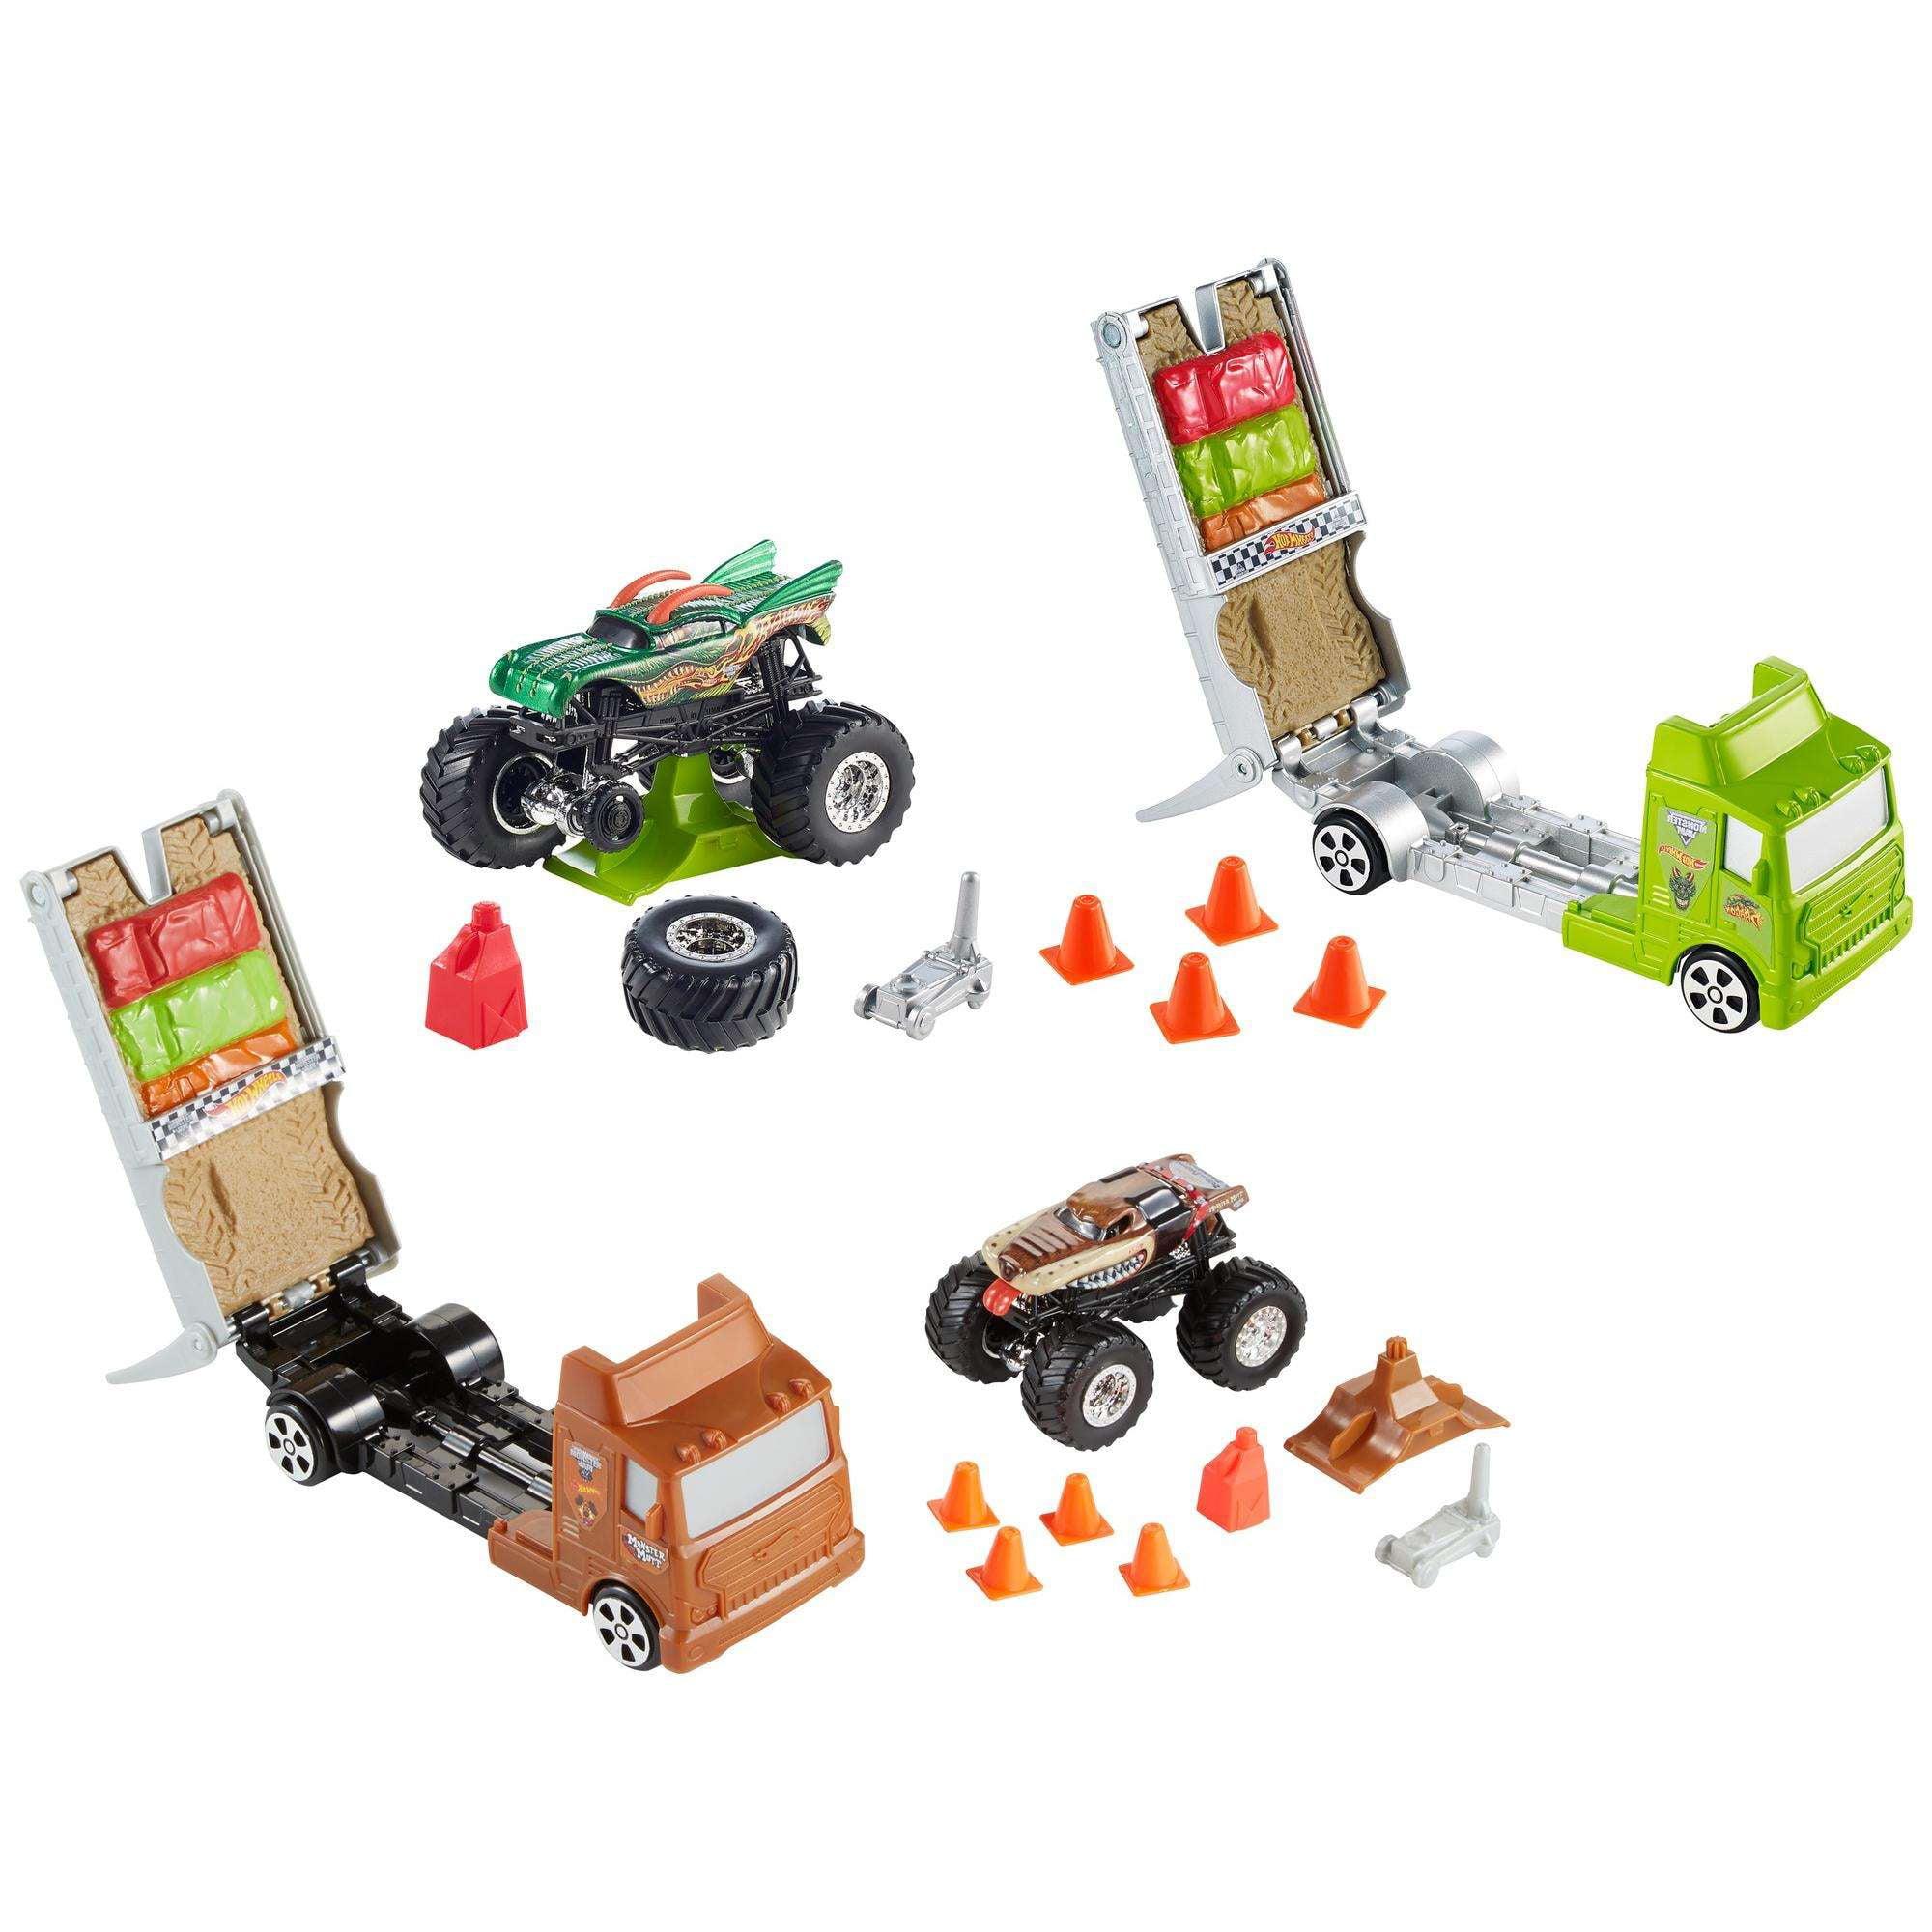 Hot Wheels Monster Jam Travel Treds (Styles May Vary) by Mattel, Inc.